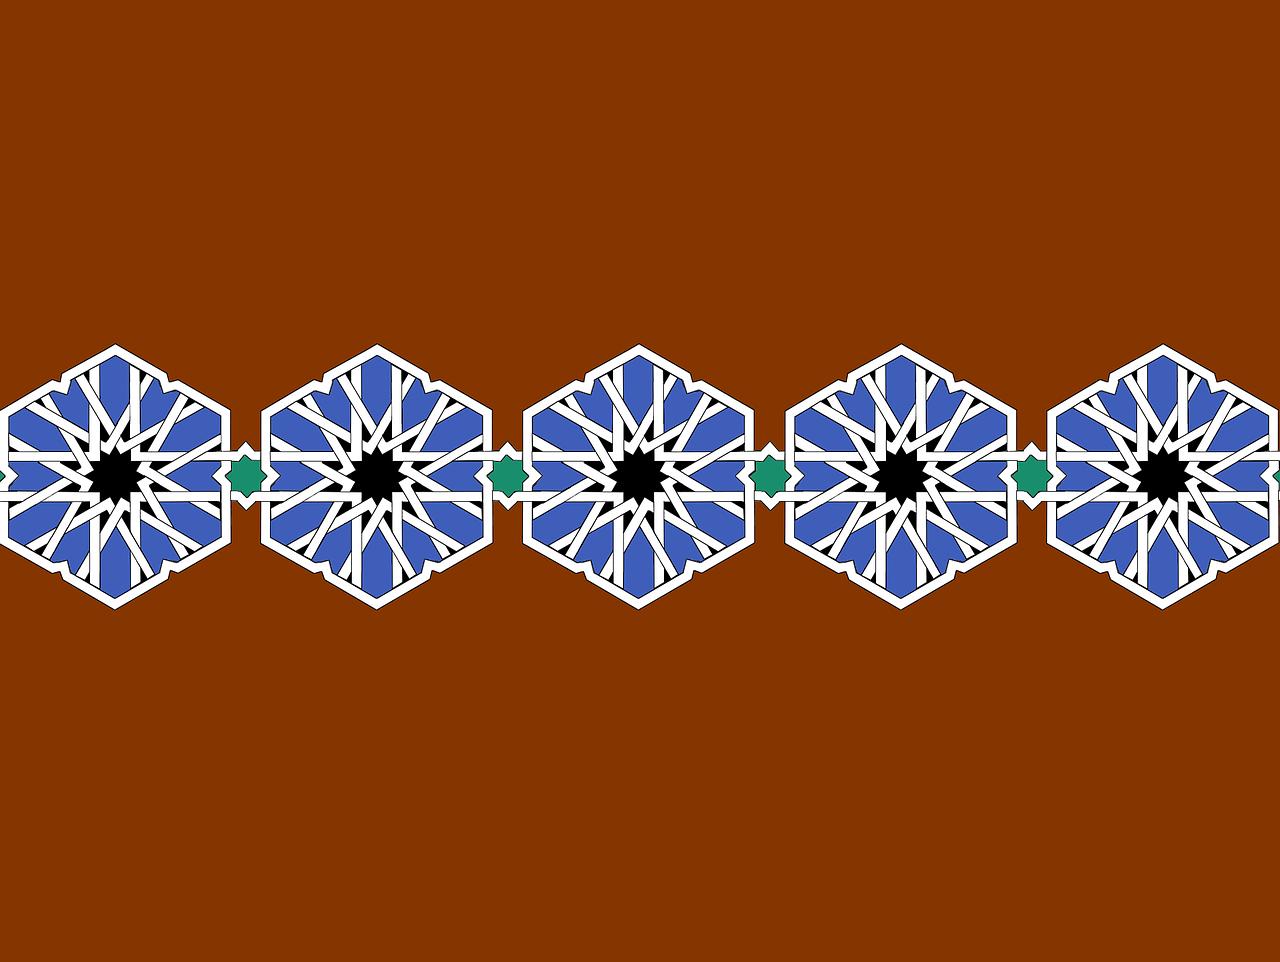 Islam,motif,geometric,model,free pictures - free photo from needpix com